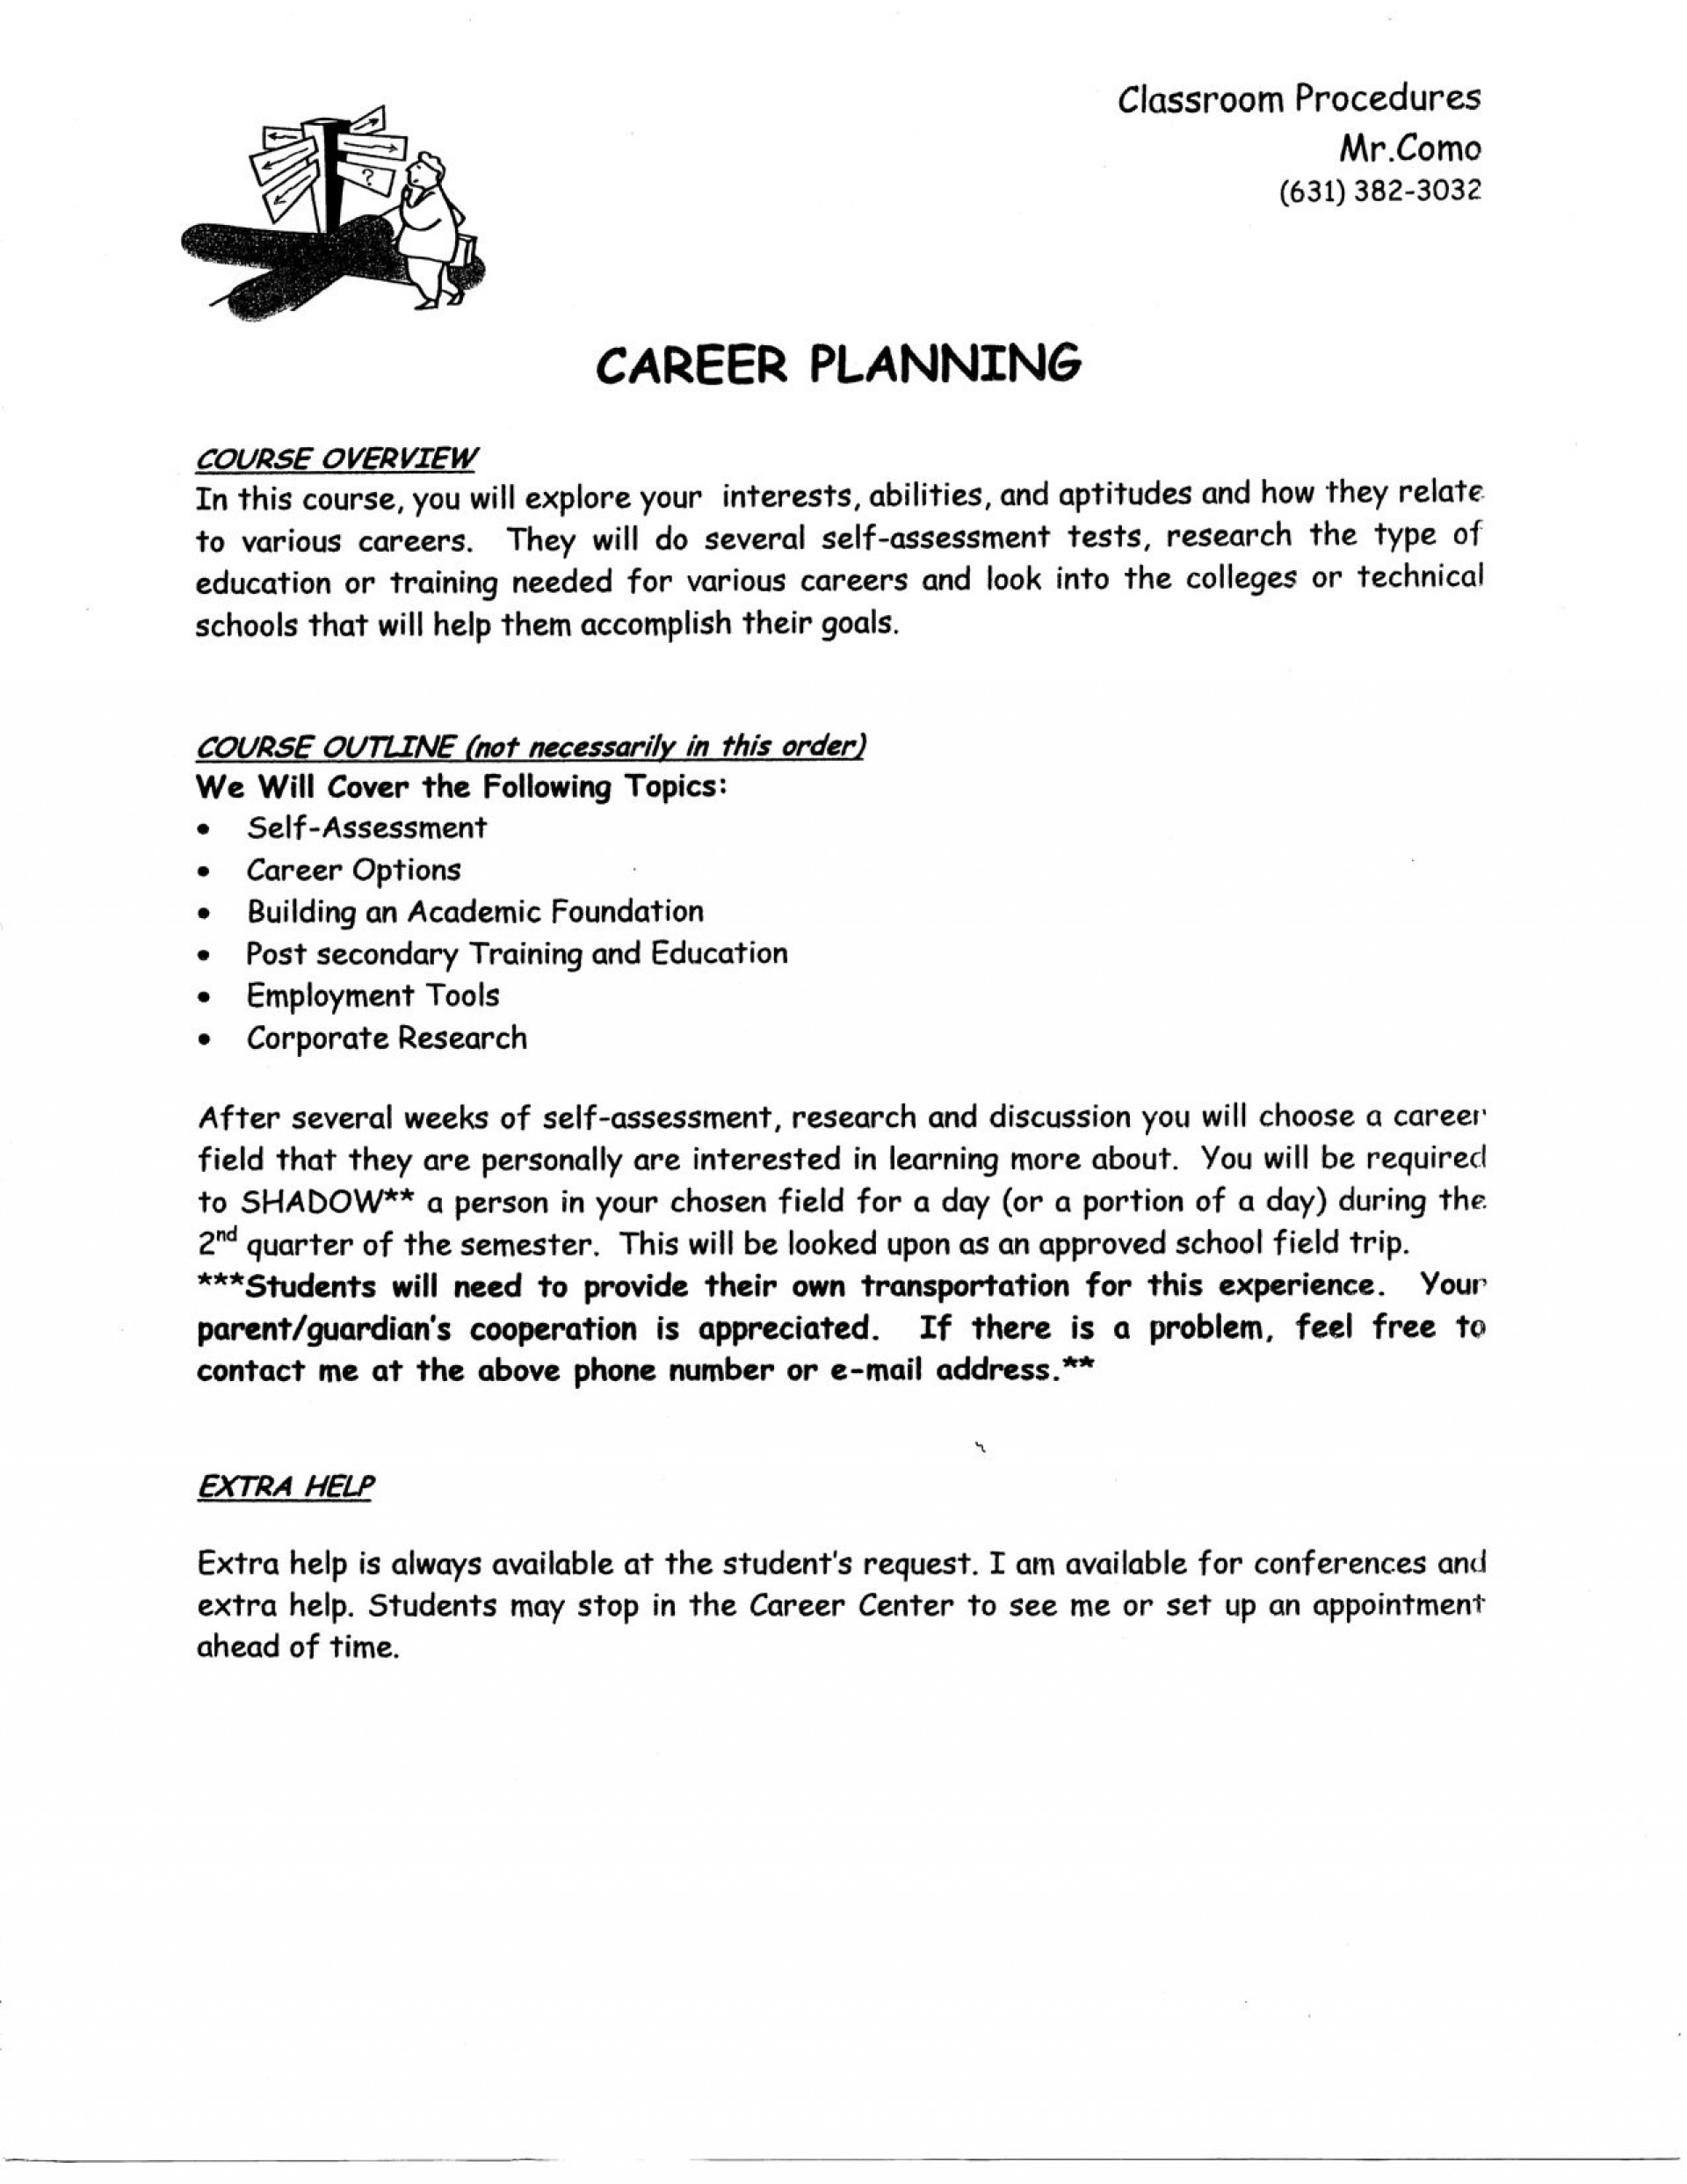 007 Career Development Essay Example Plans Template Plan Planni Outline Goal Exploration Nursing Wonderful Topics Program 1920